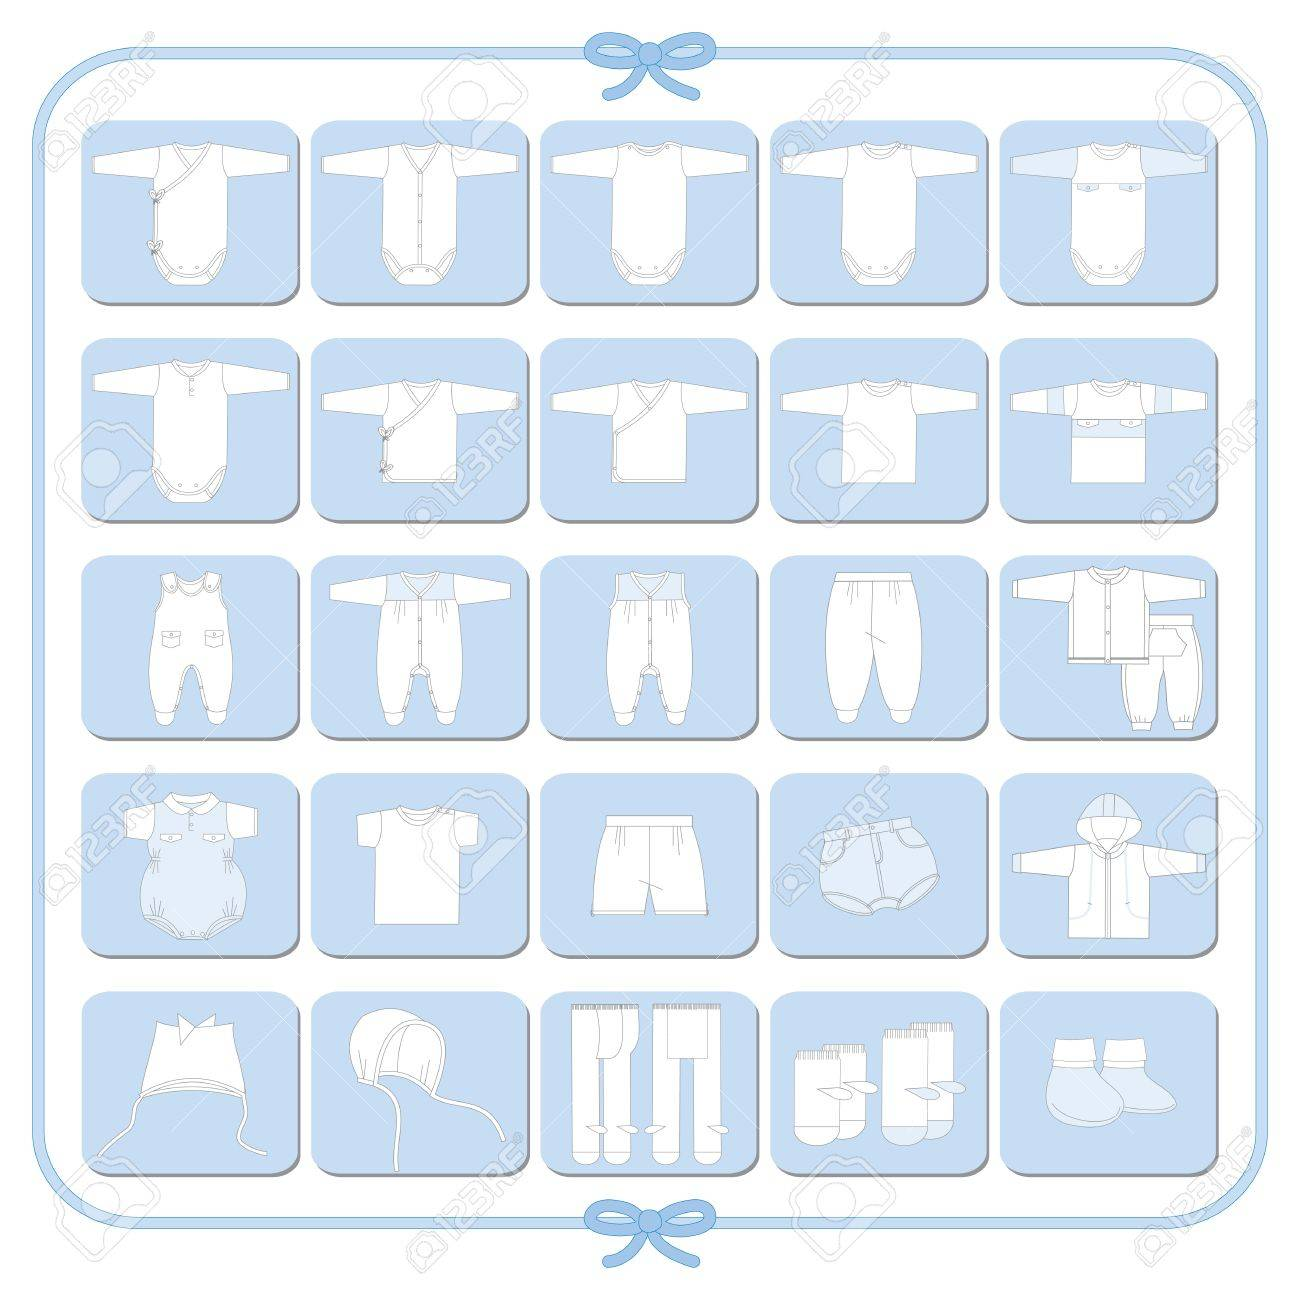 Pictograms of white babyboy dresses - 14410183